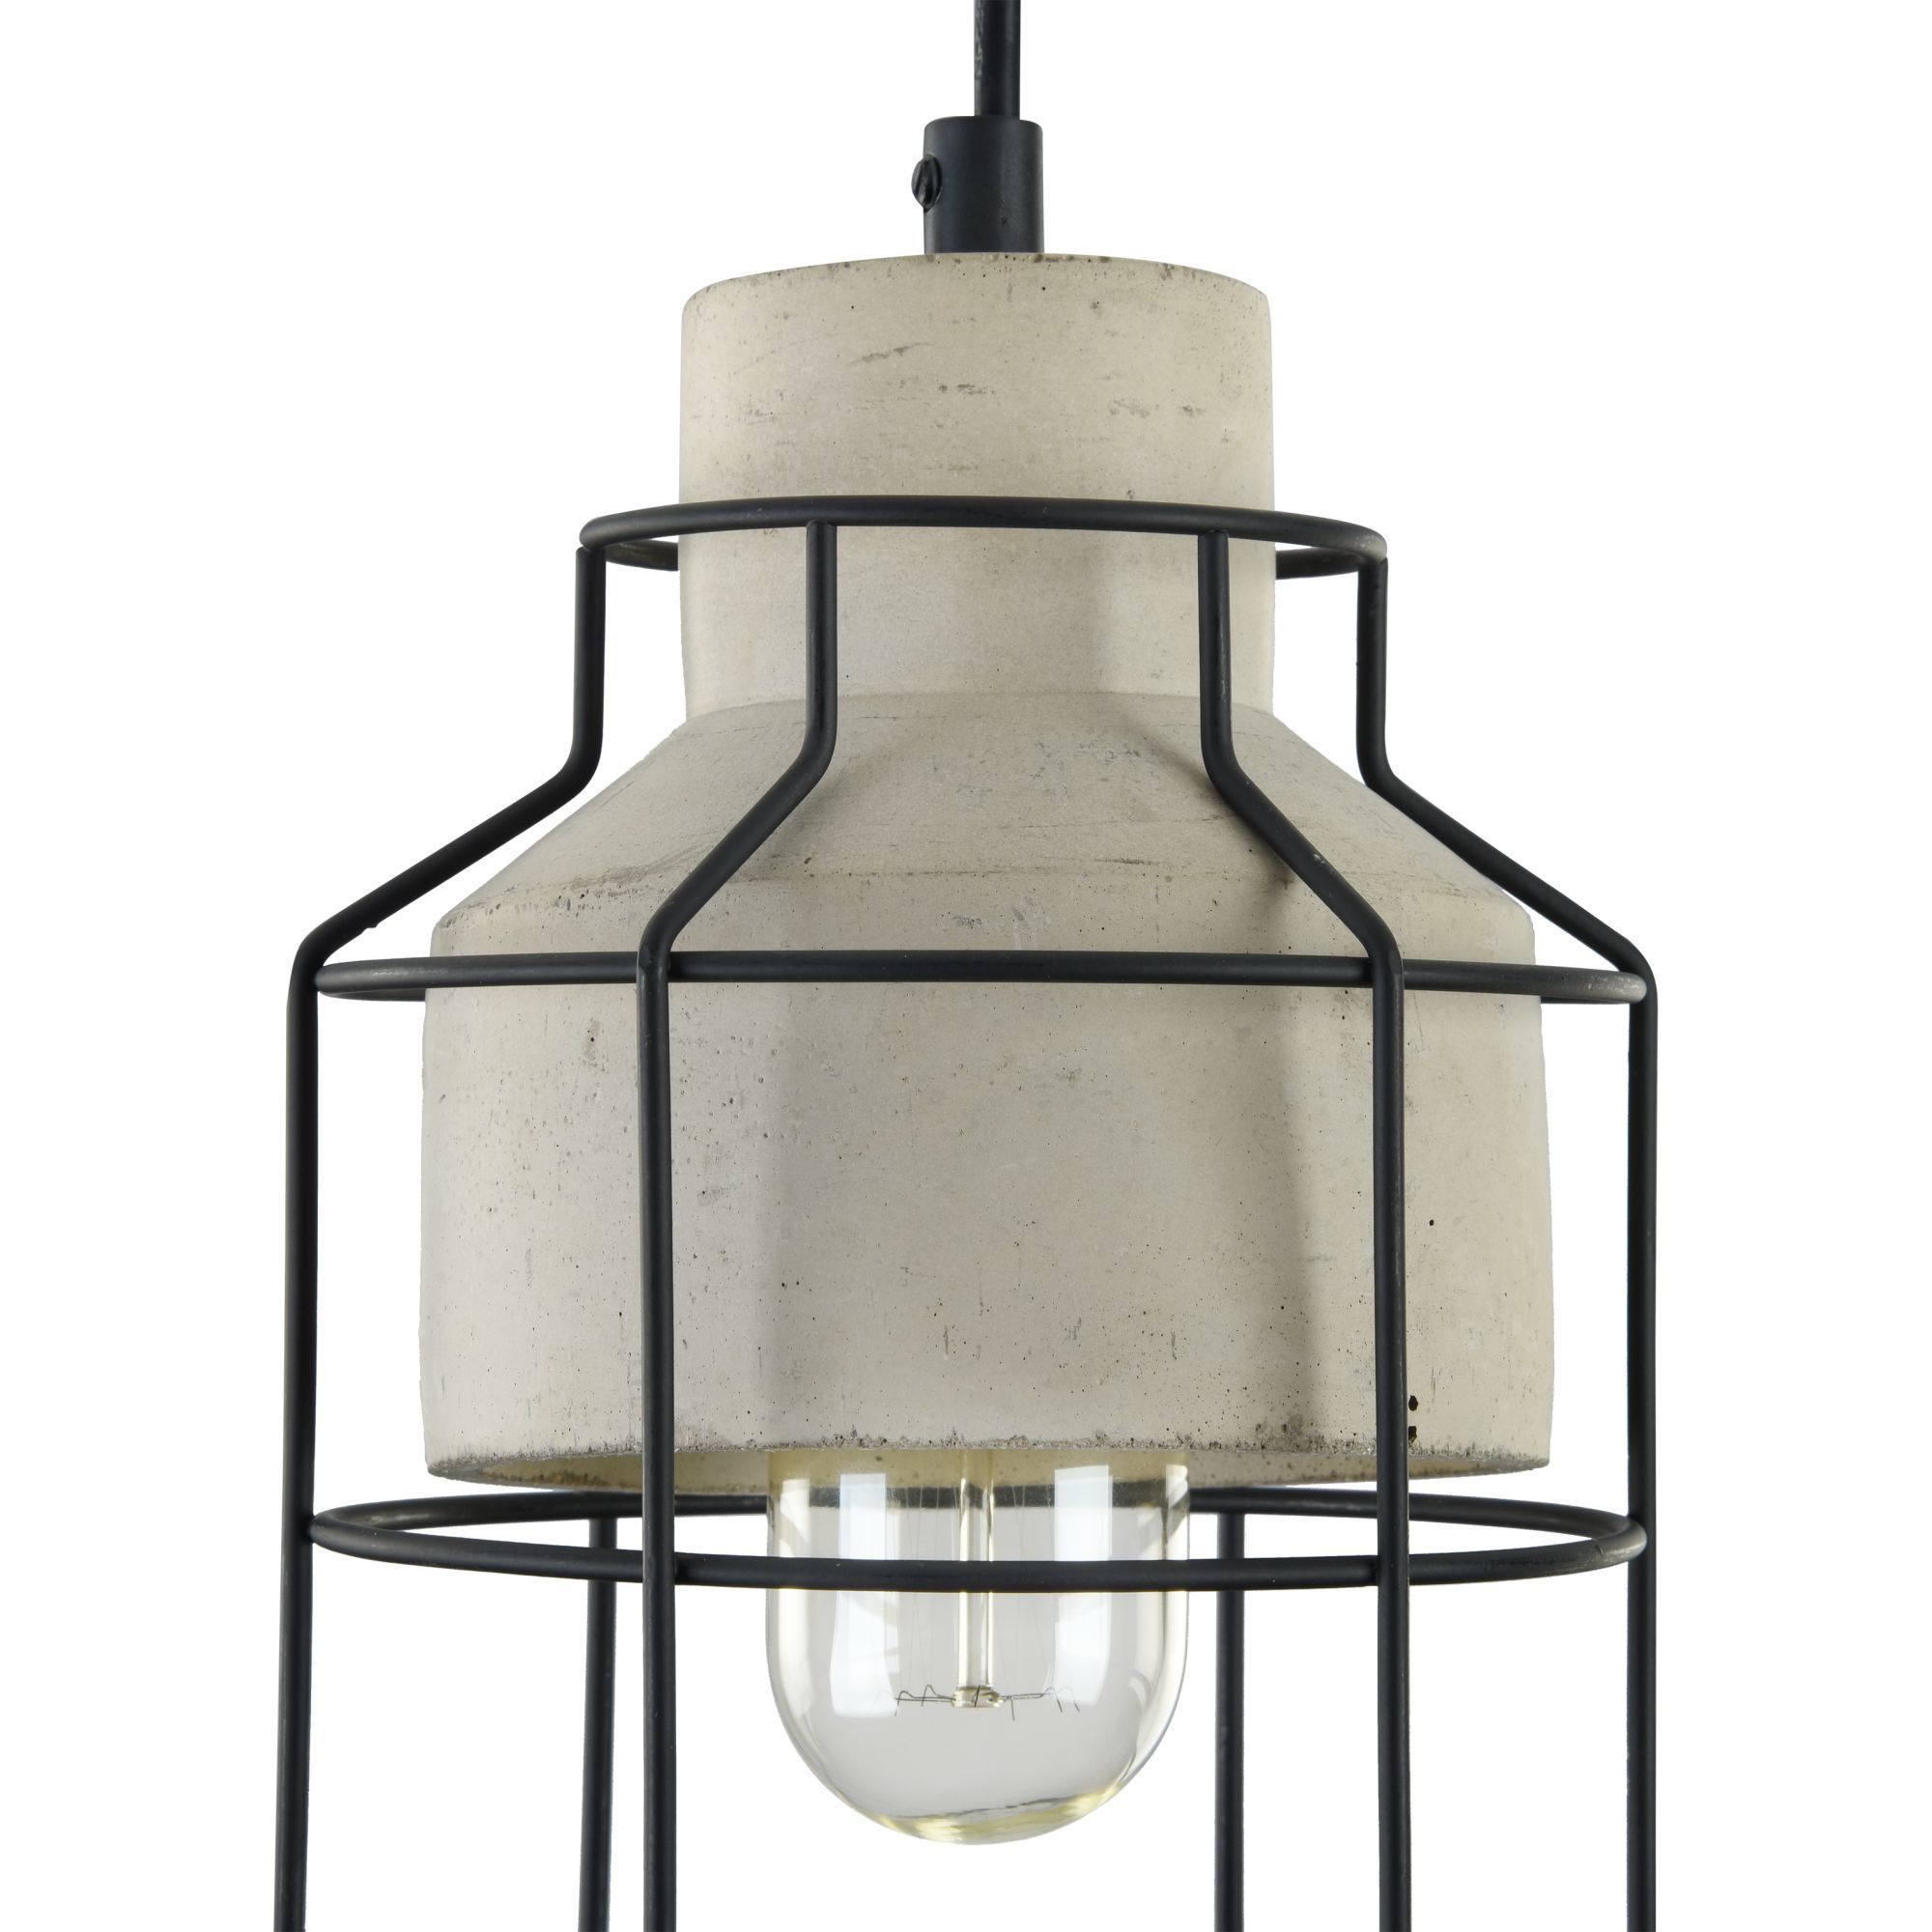 Подвесной светильник Maytoni Gosford T441-PL-01-GR, 1xE27x60W, черный, серый, металл, бетон - фото 9